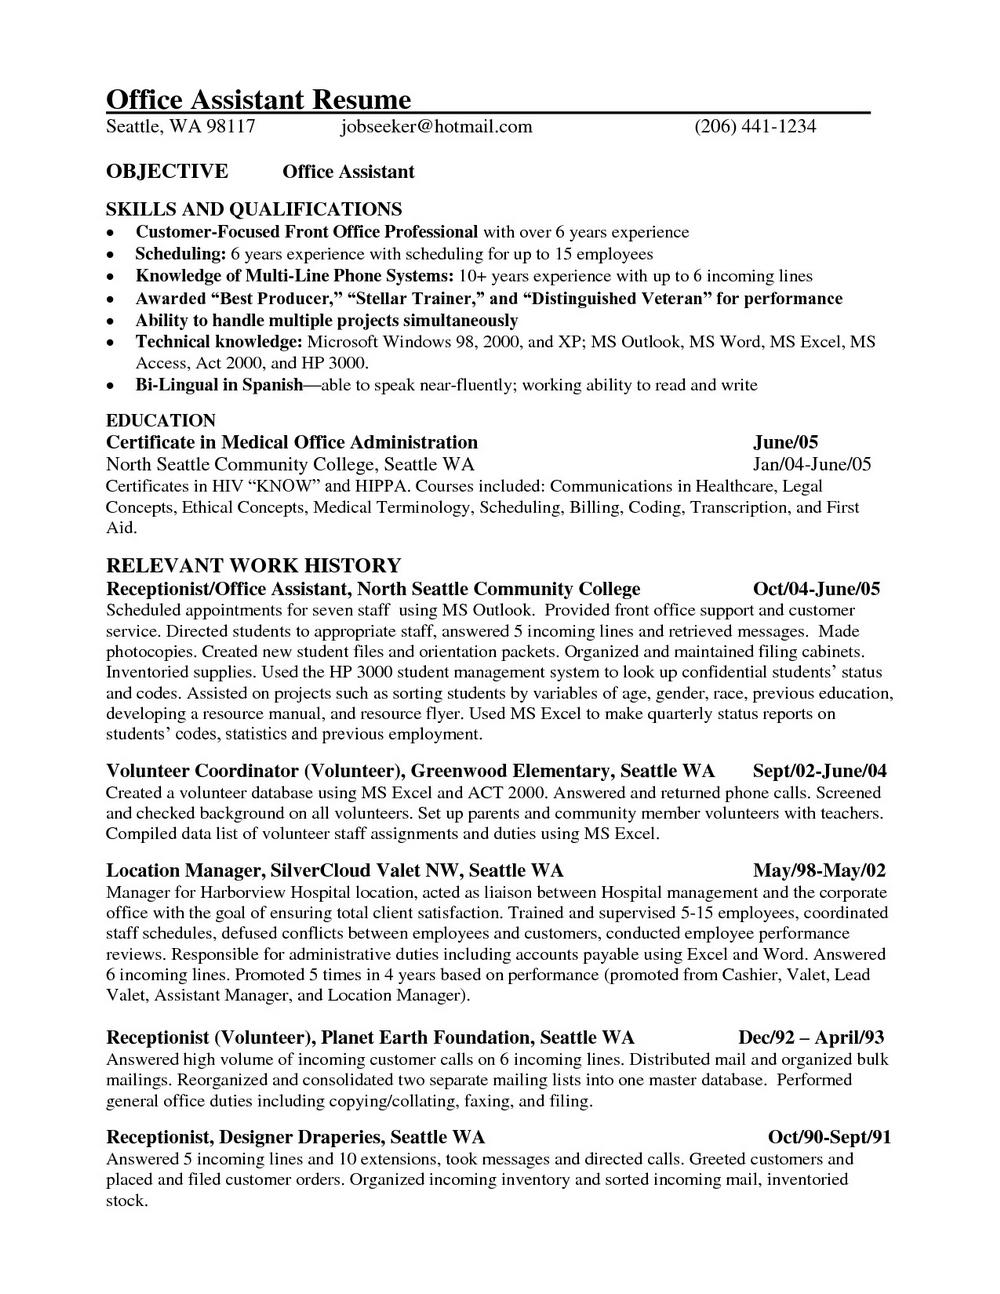 Resume Samples For Medical Office Assistant